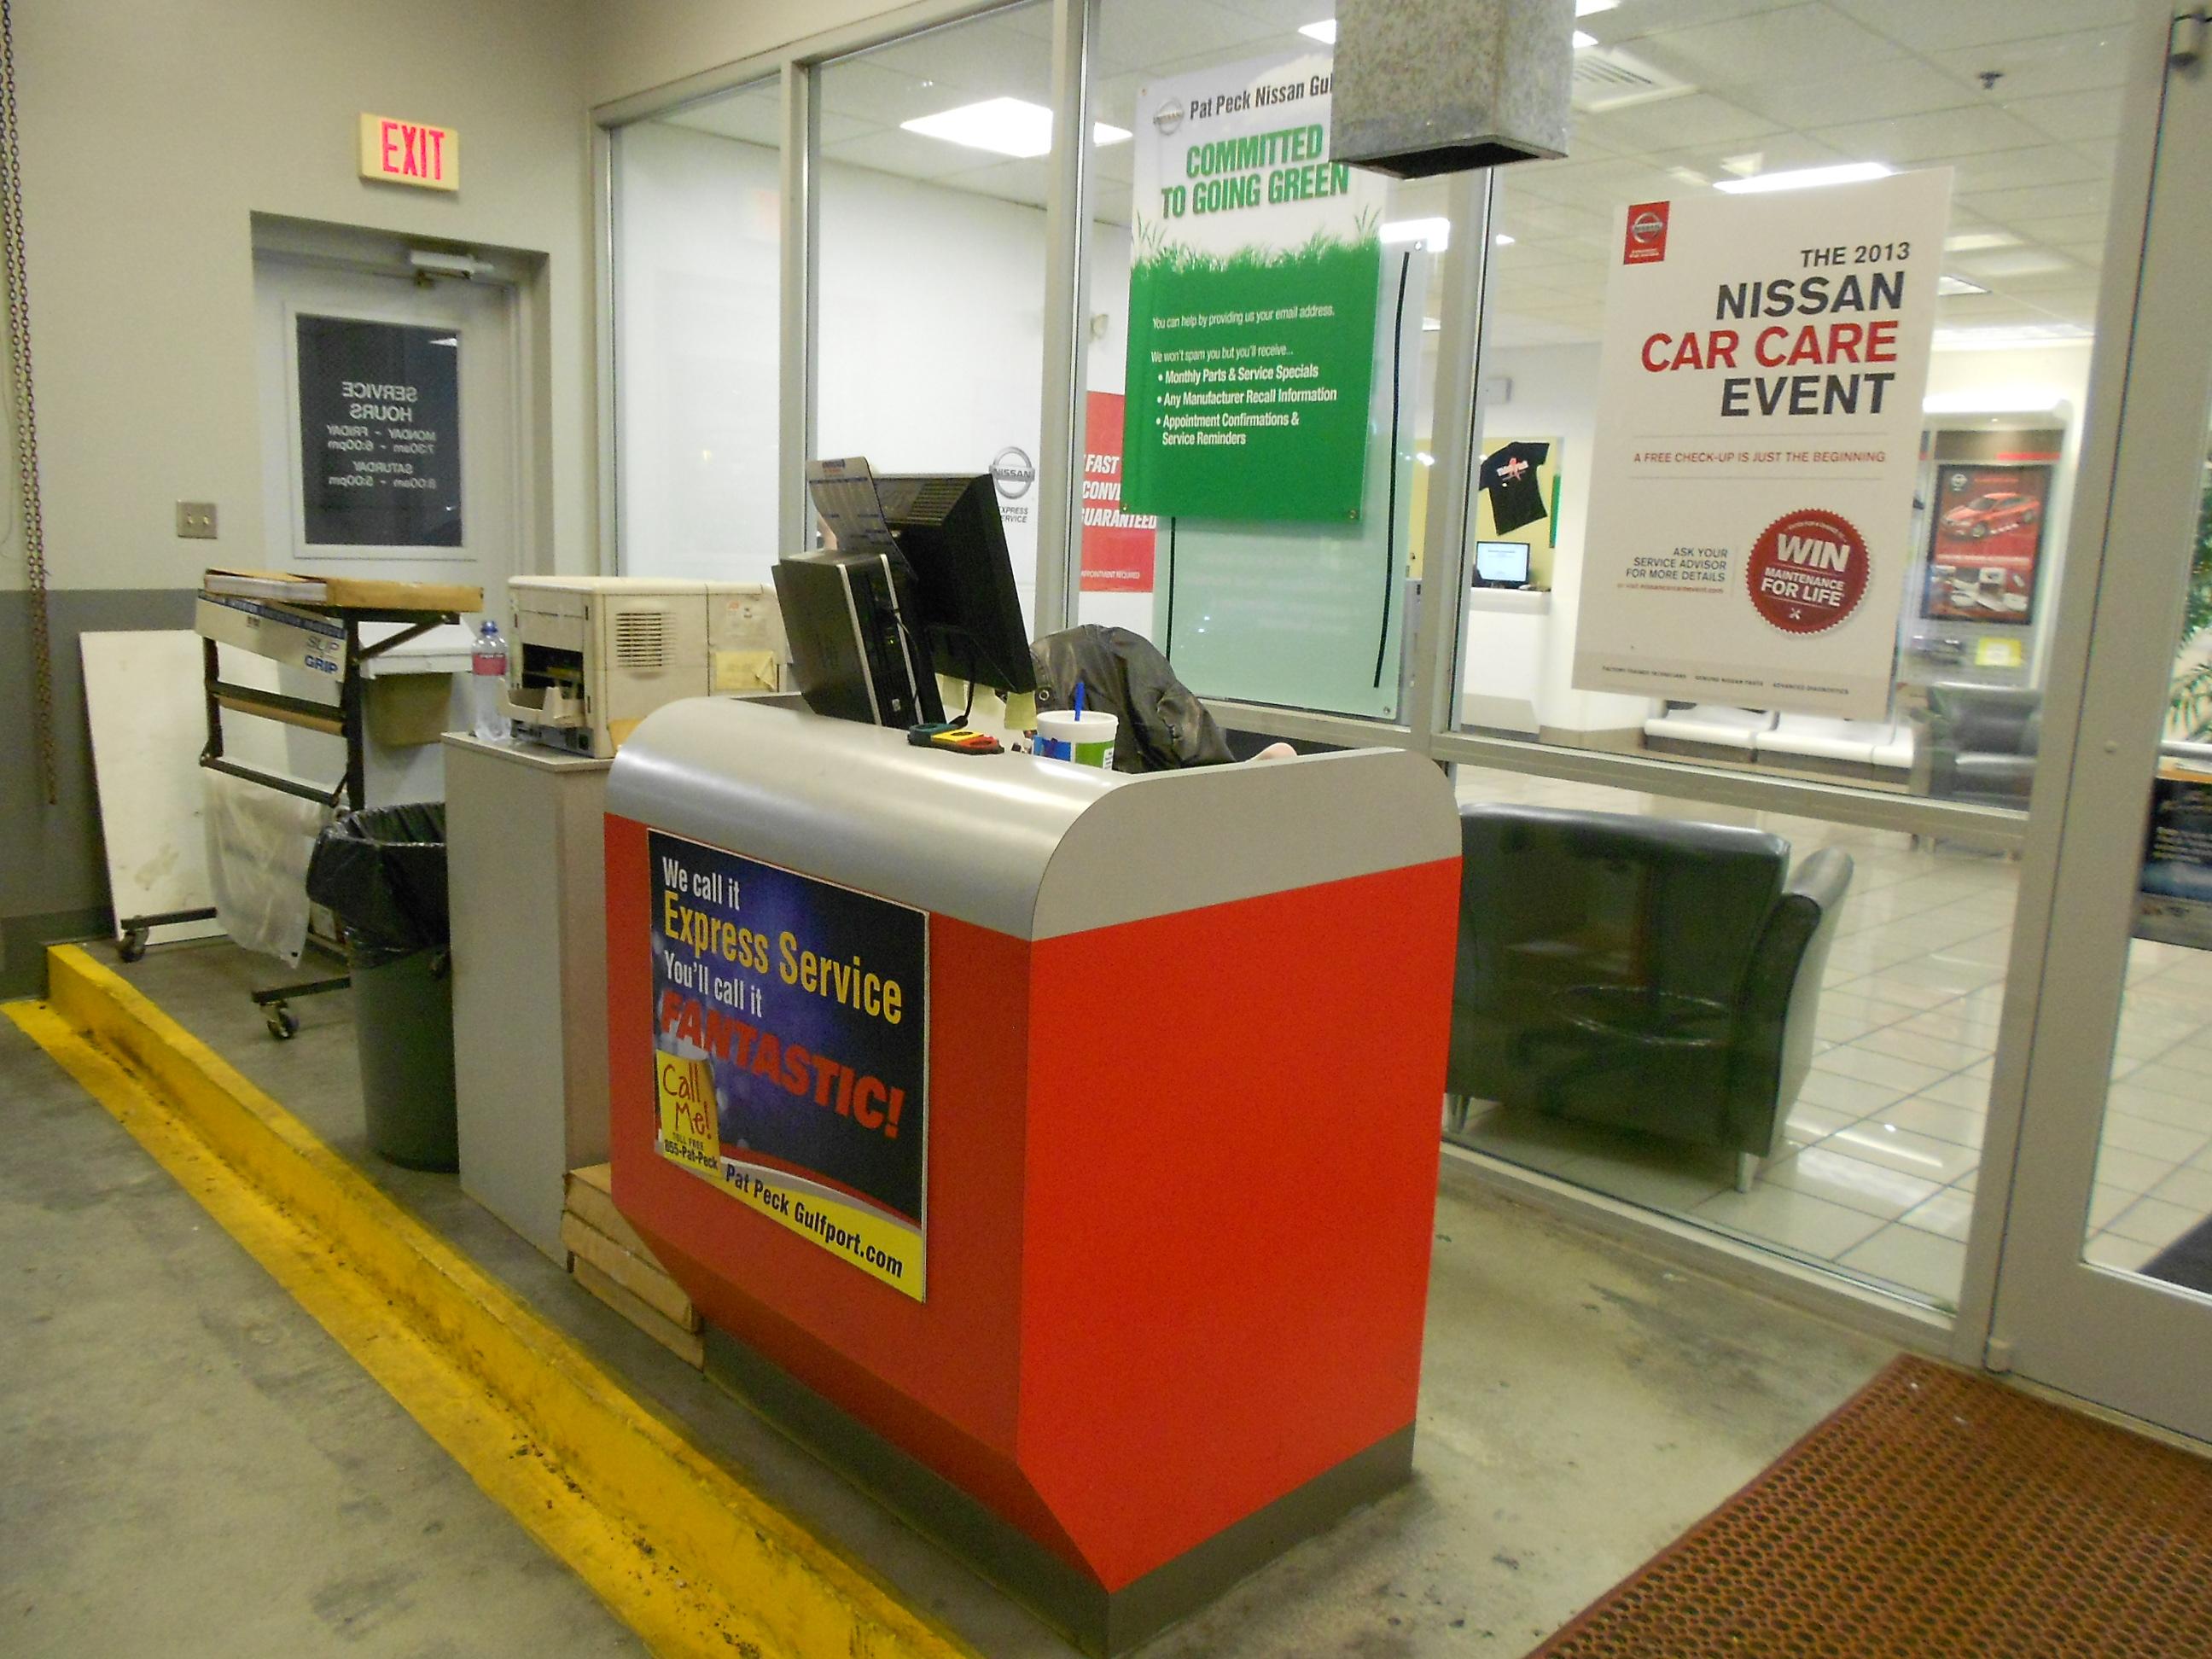 Pat Peck Nissan - Gulfport 9480 Highway 49, Gulfport, MS 39503 - YP.com